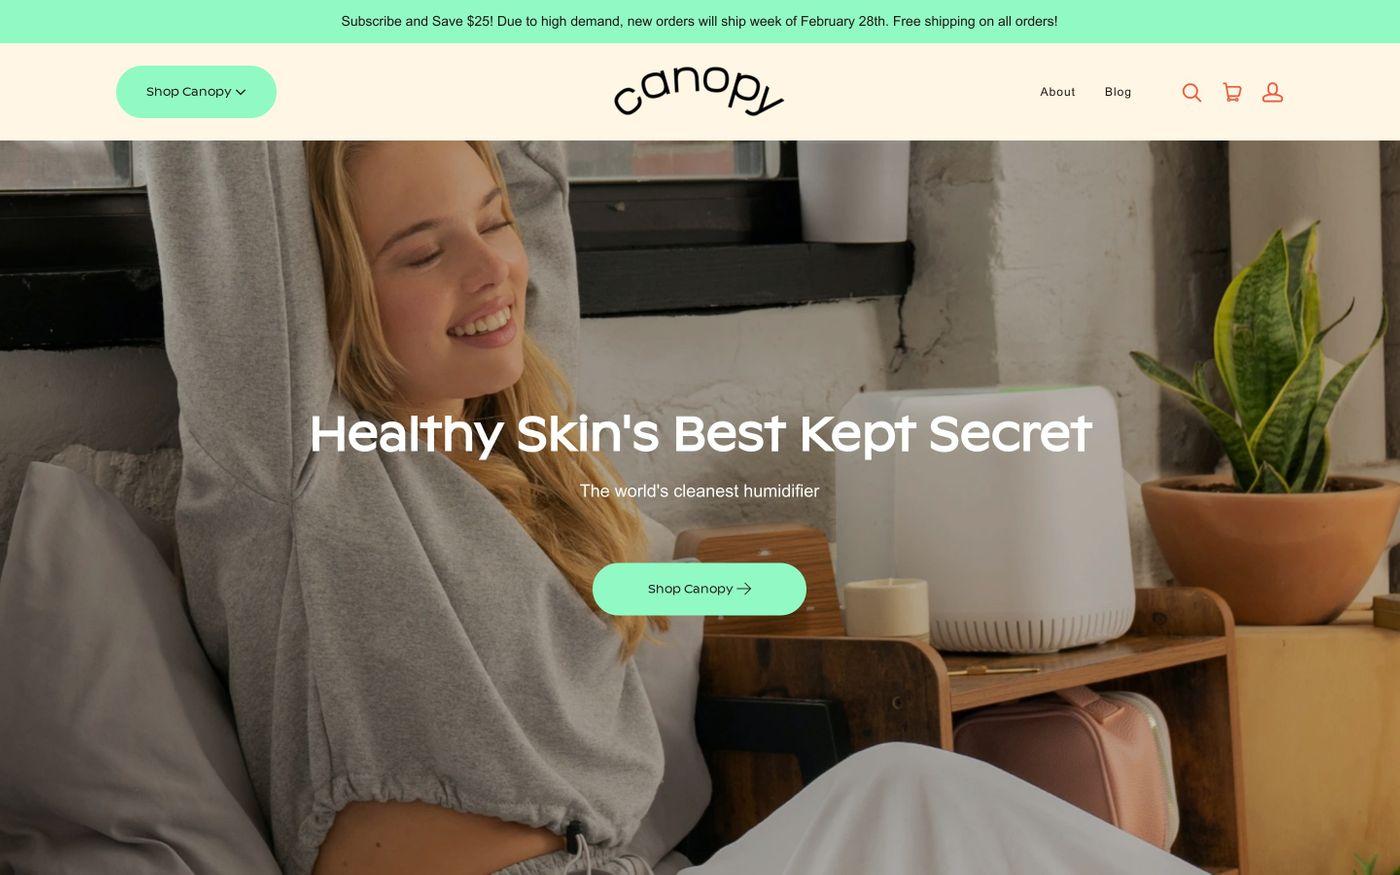 Screenshot of Canopy website